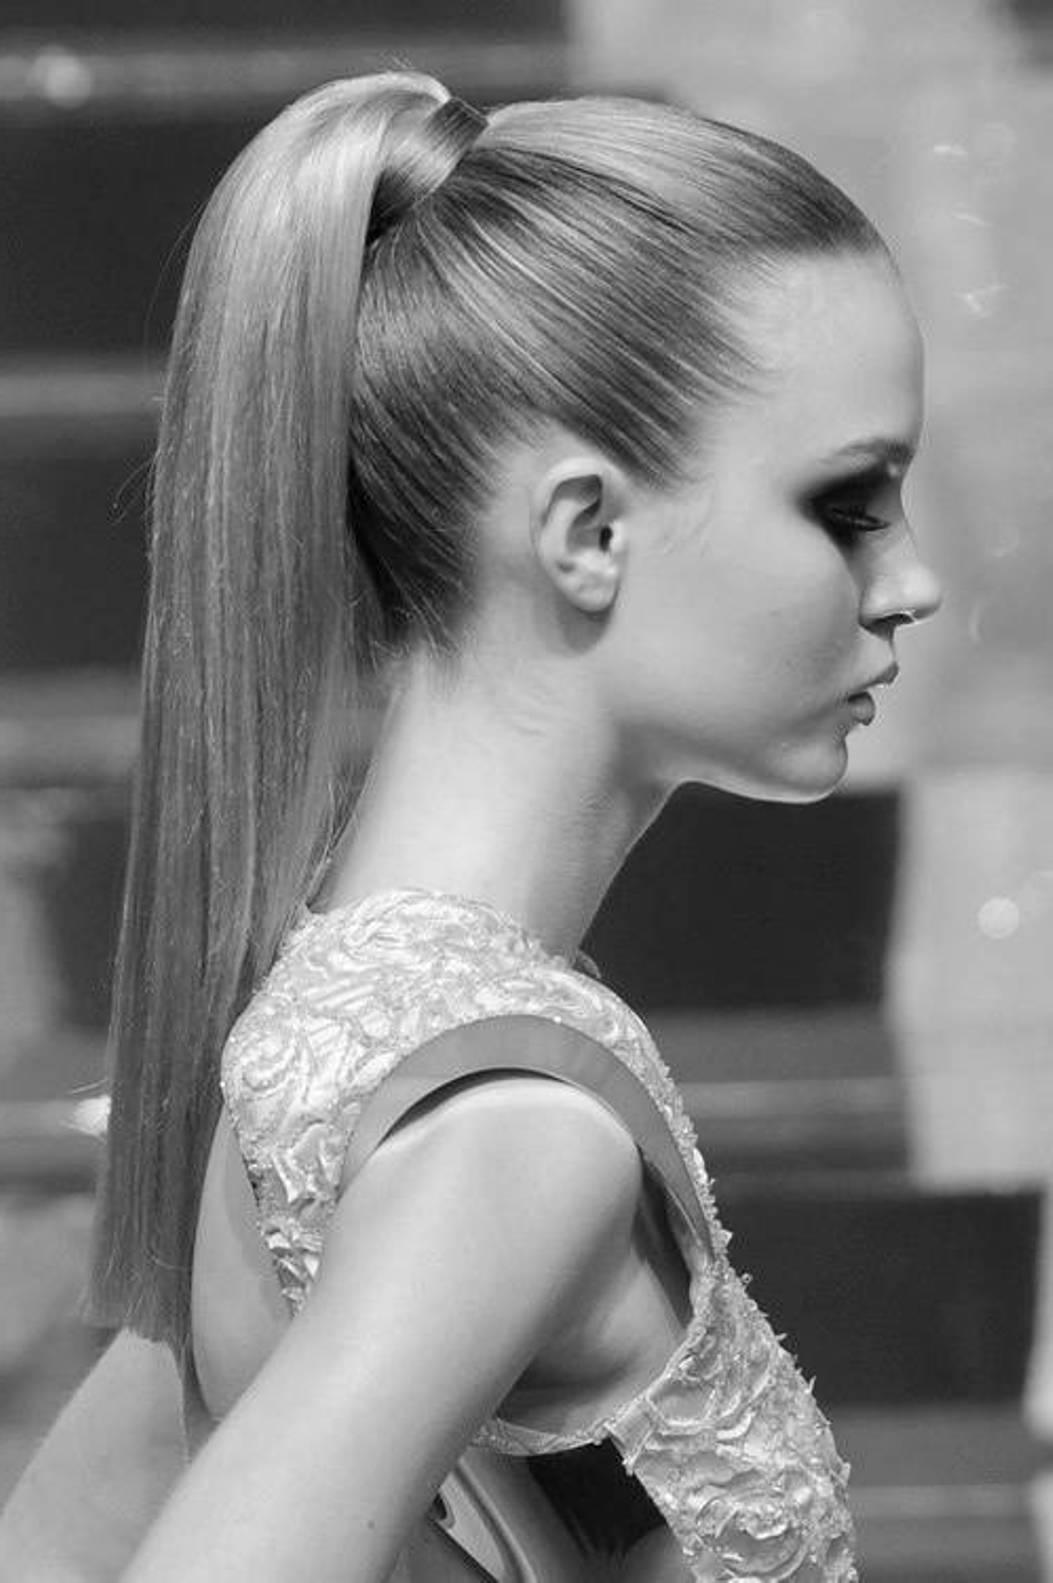 Pleasant Sleek Cute Ponytail Hairstyle Fmag Com Short Hairstyles Gunalazisus